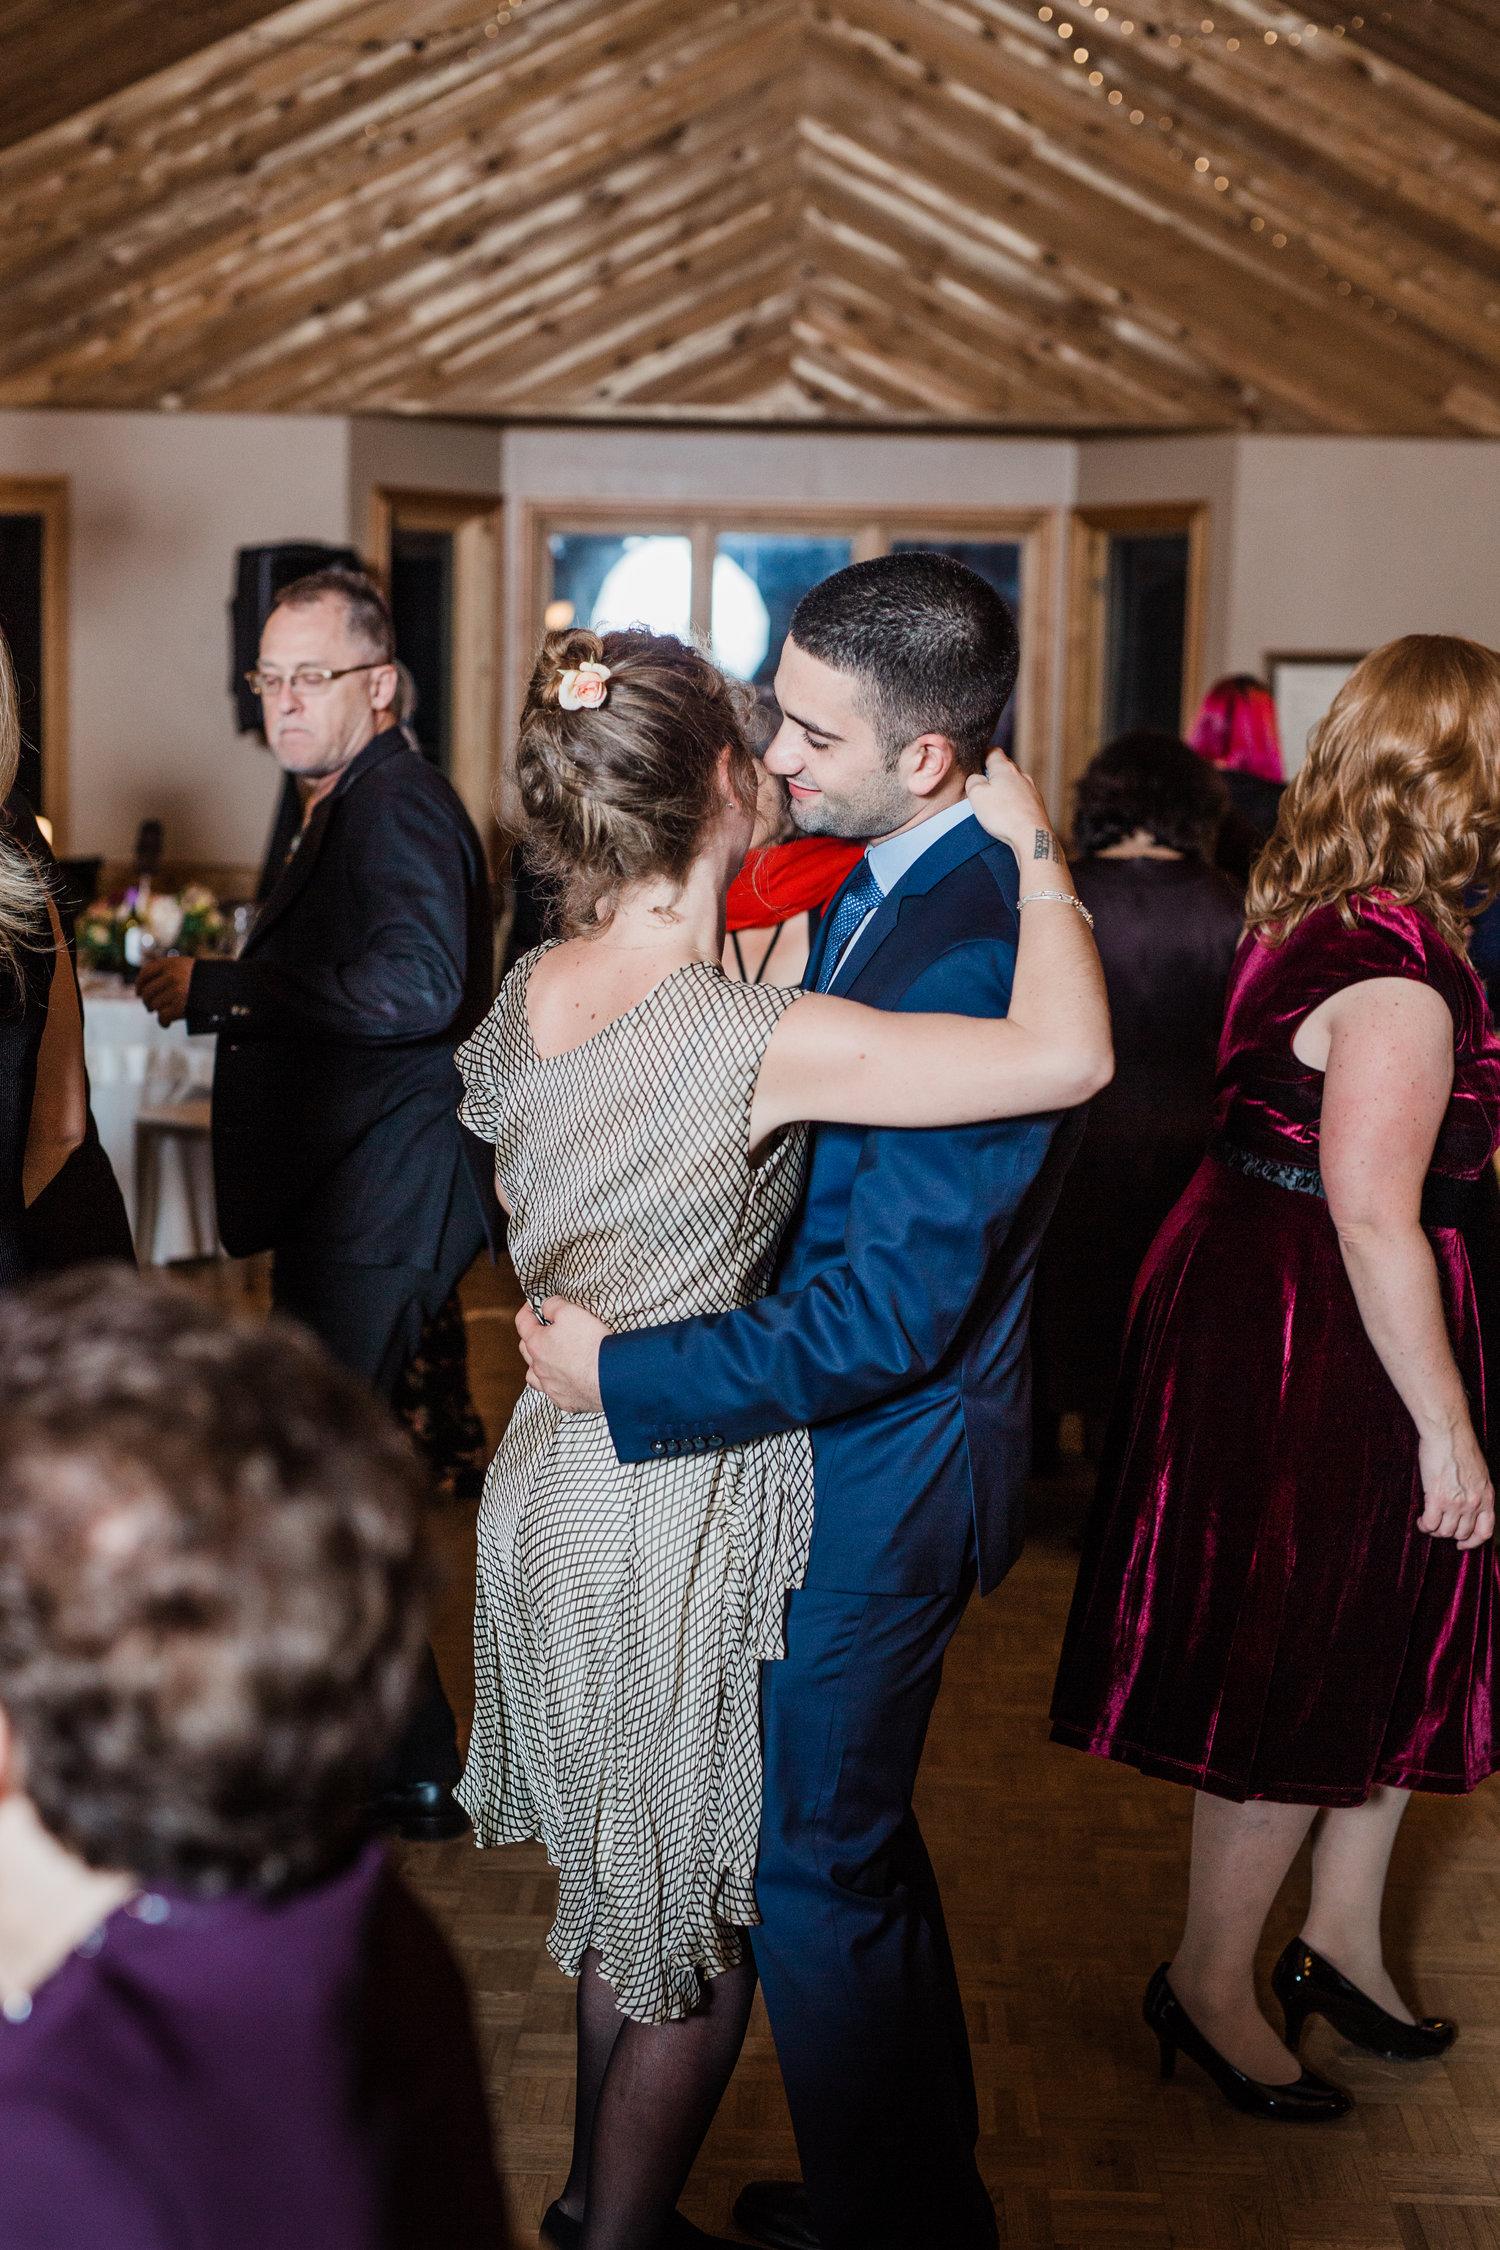 Amir-Golbazi-Danielle-Giroux-Photography_Toronto-Wedding_Cedarwood_Rachel-Paul_798.jpg